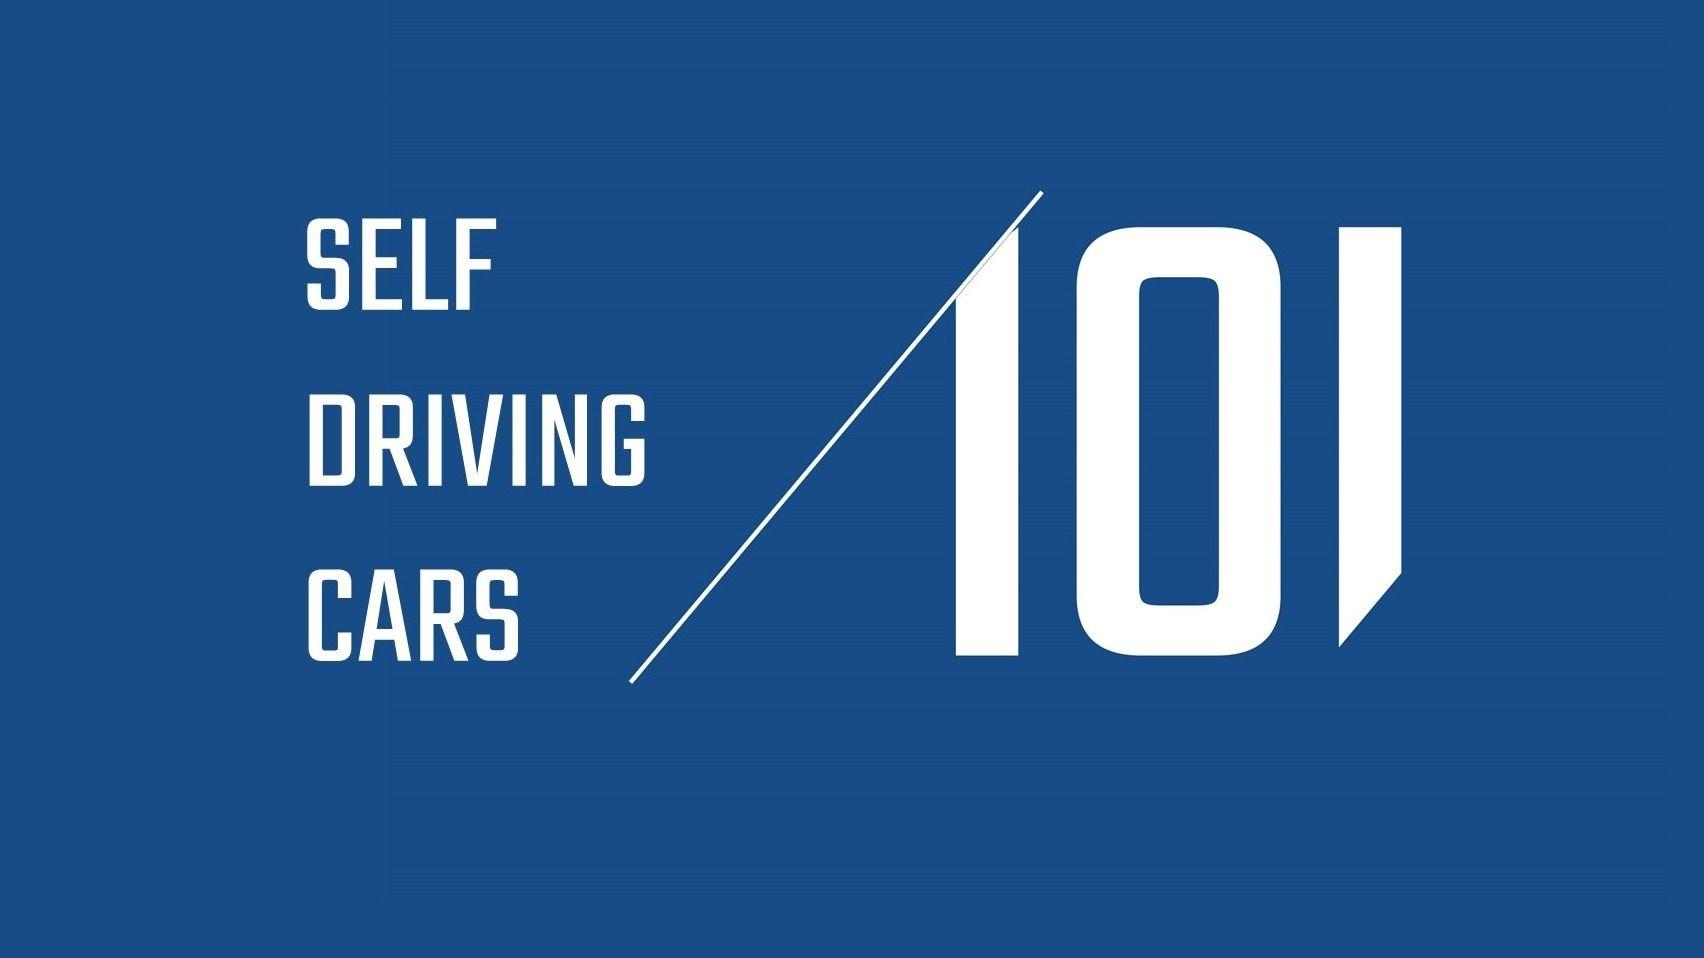 SF Self Driving Cars 101